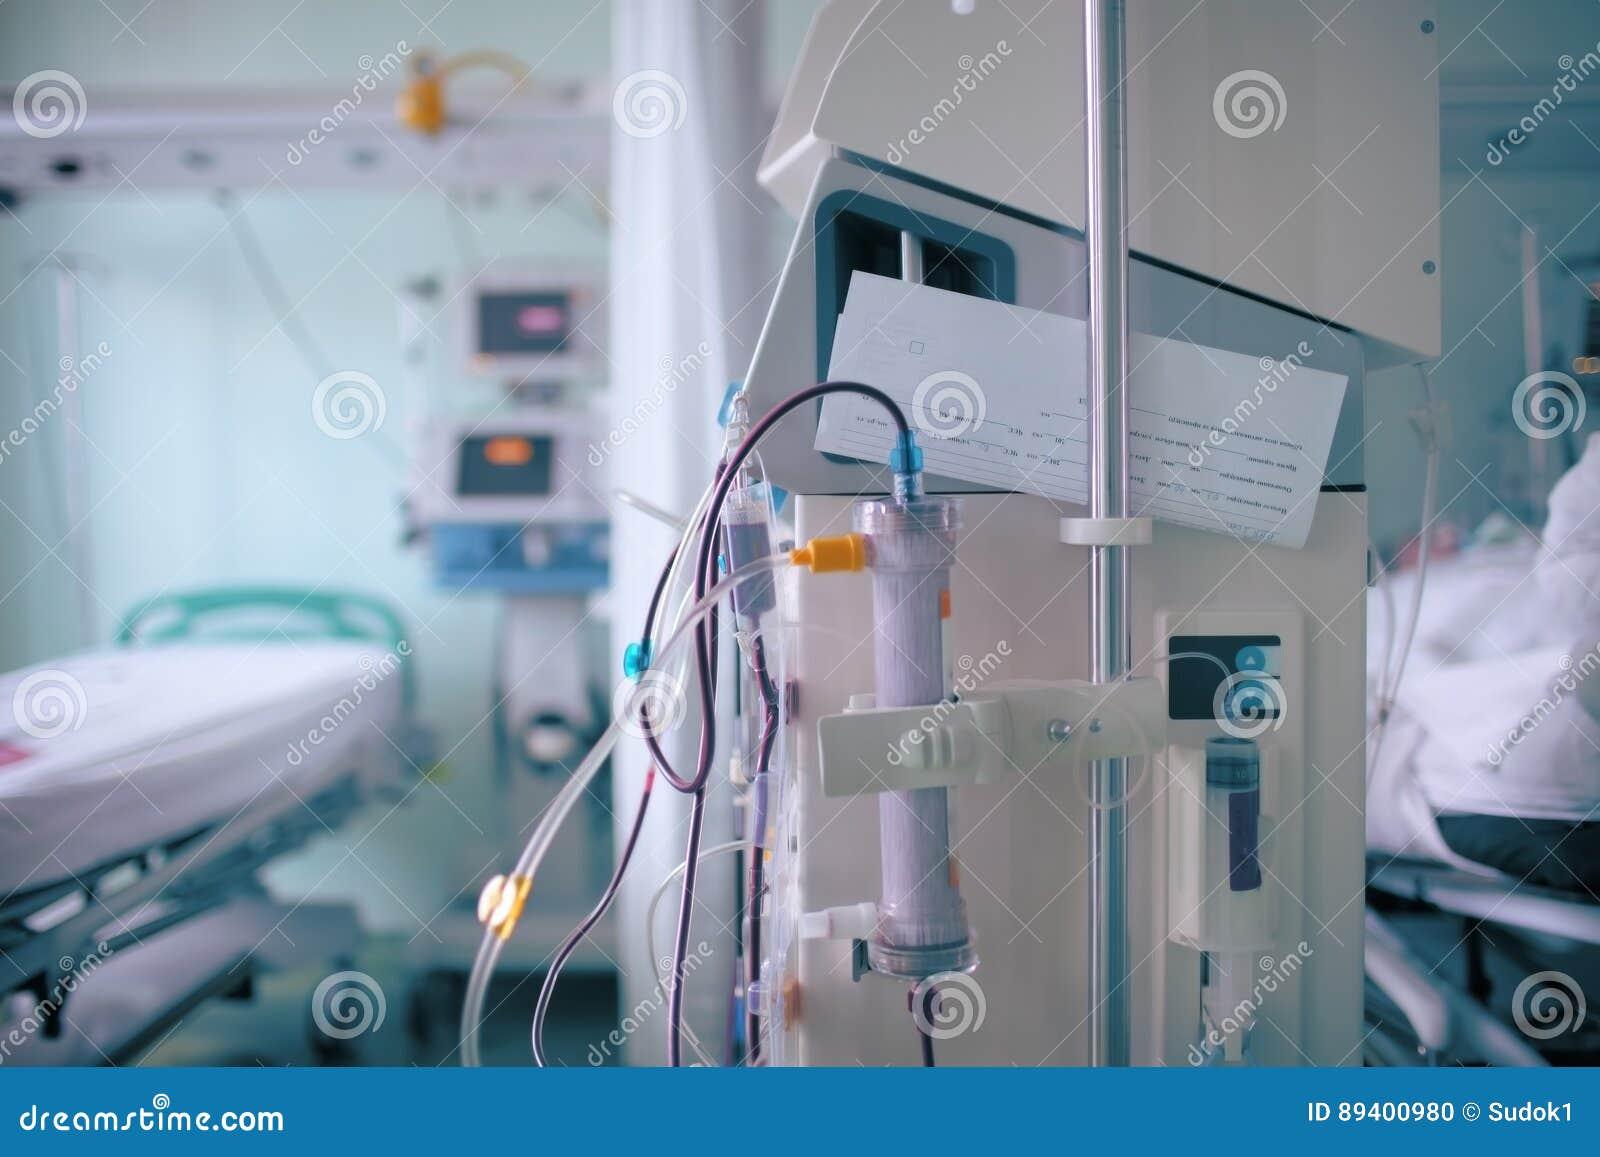 Chambre d hôpital comme fond médical